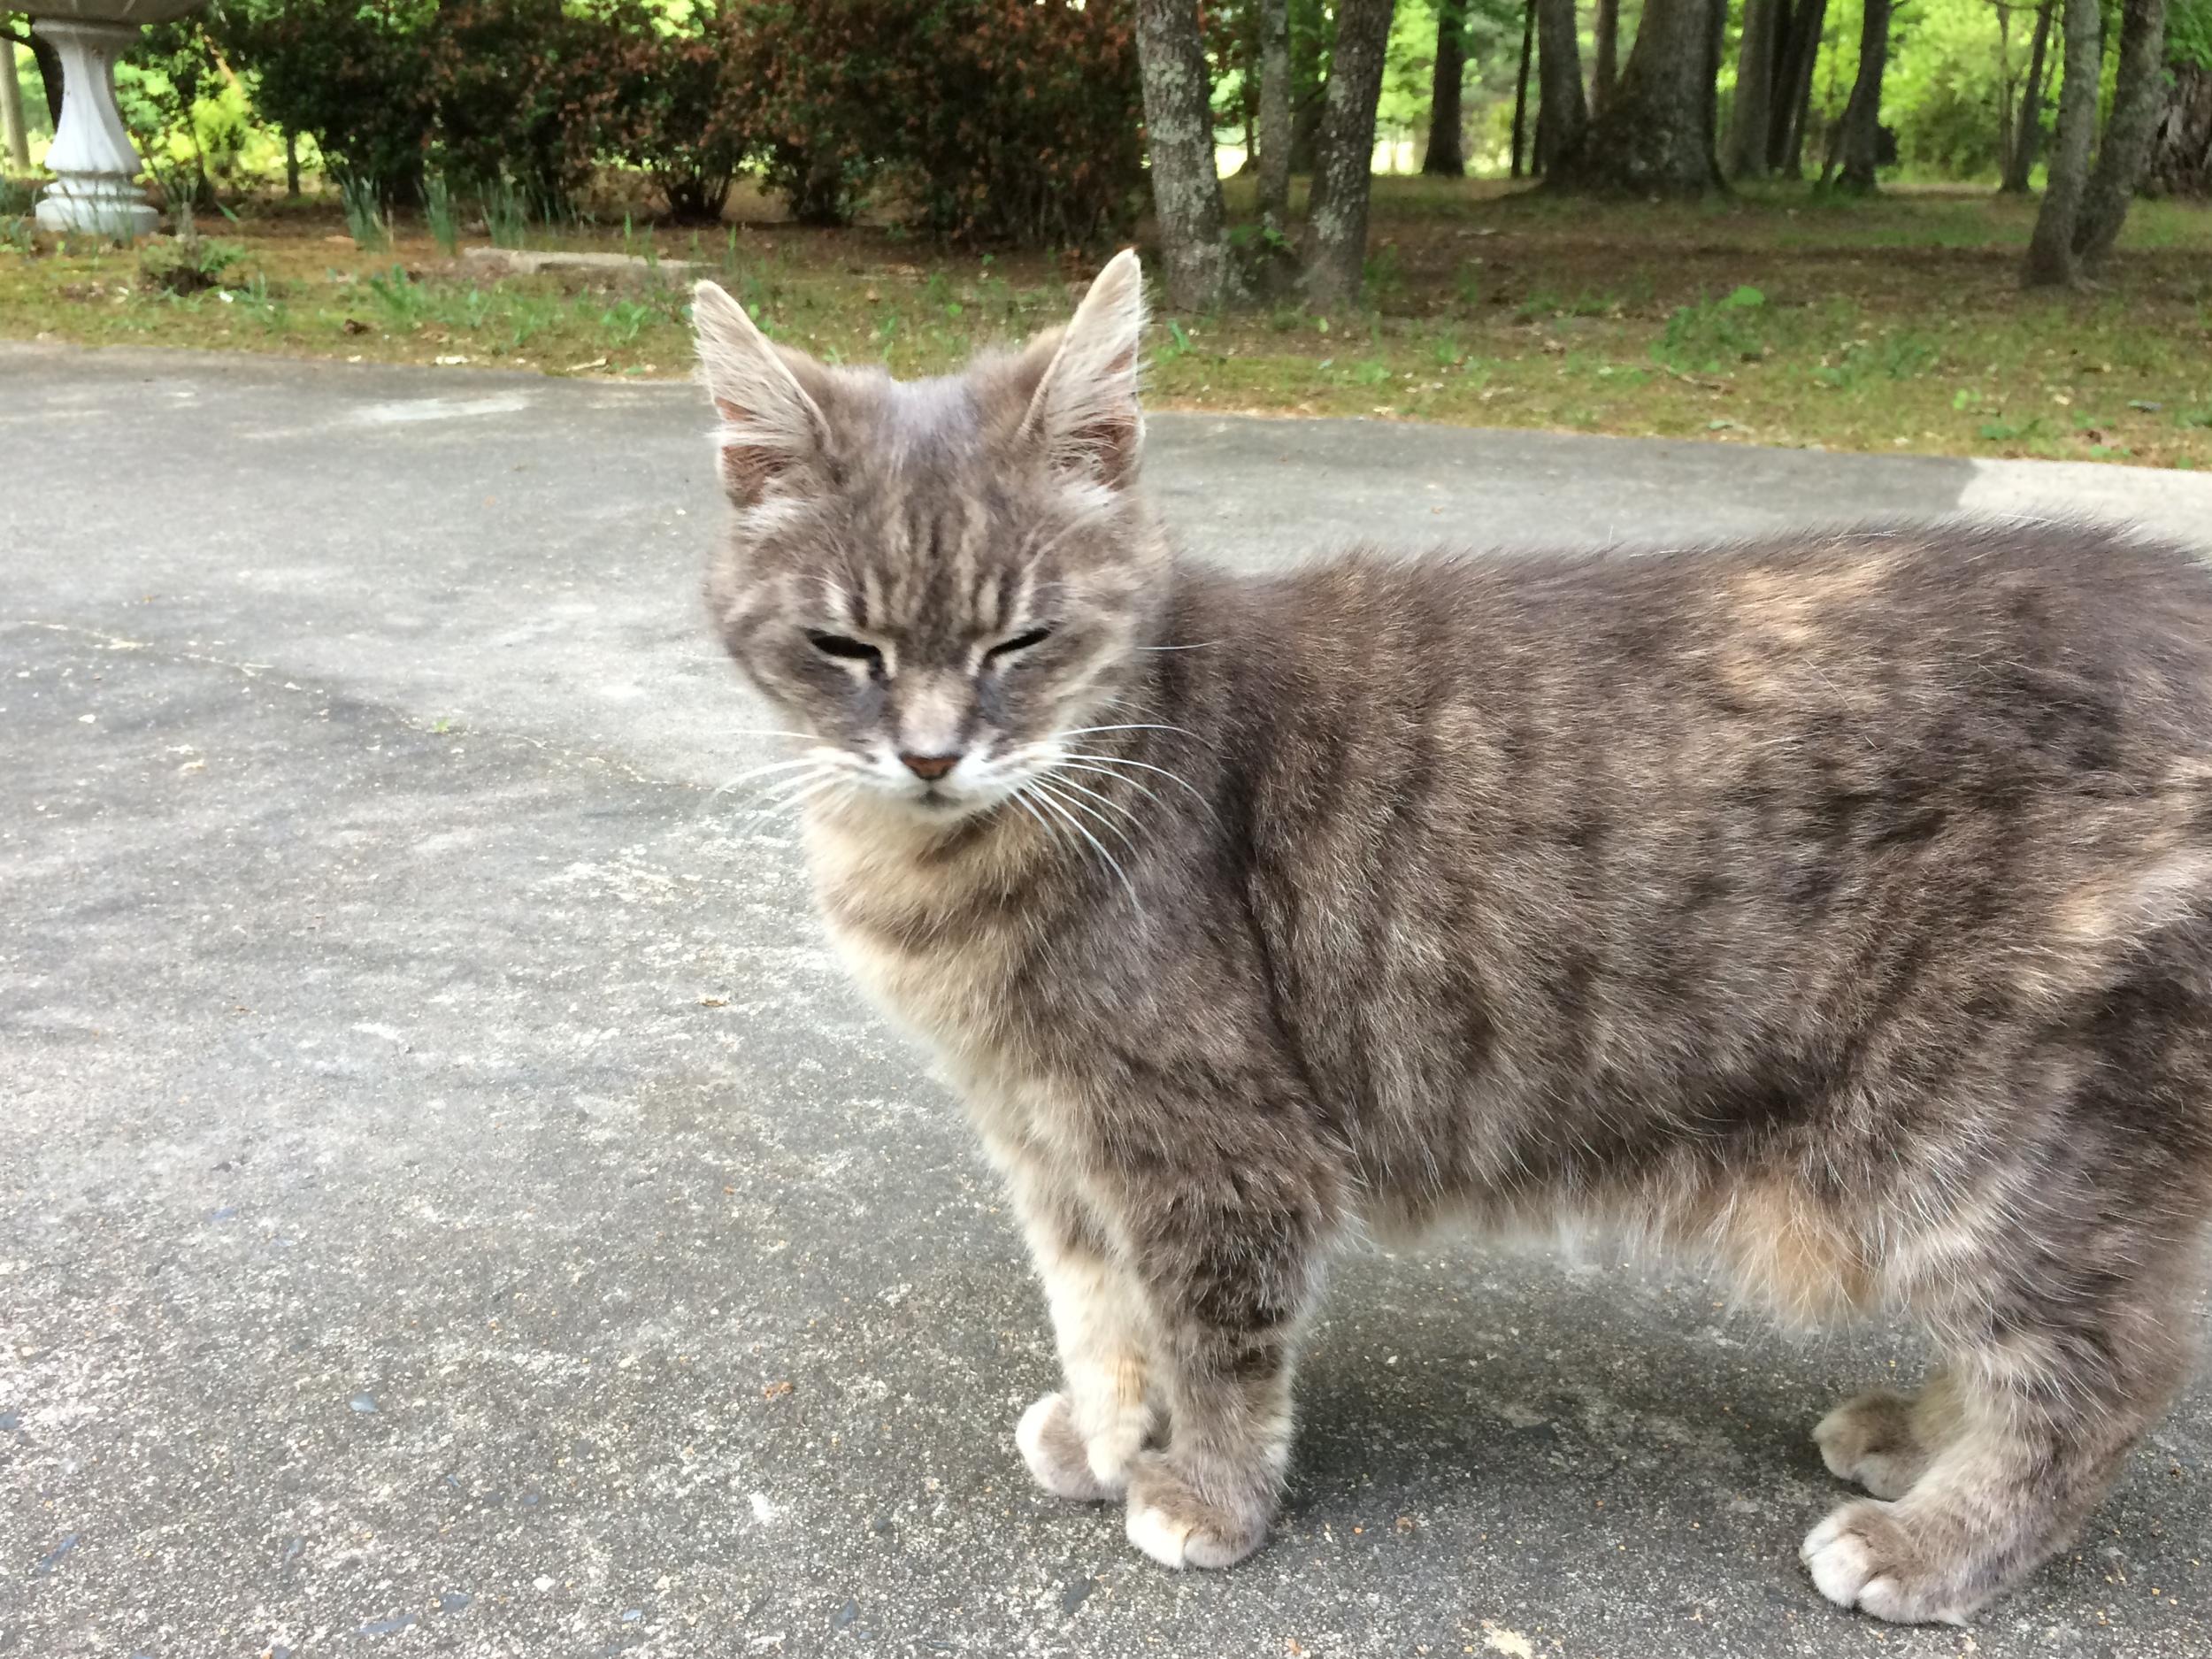 Mom's kitty, Smokey